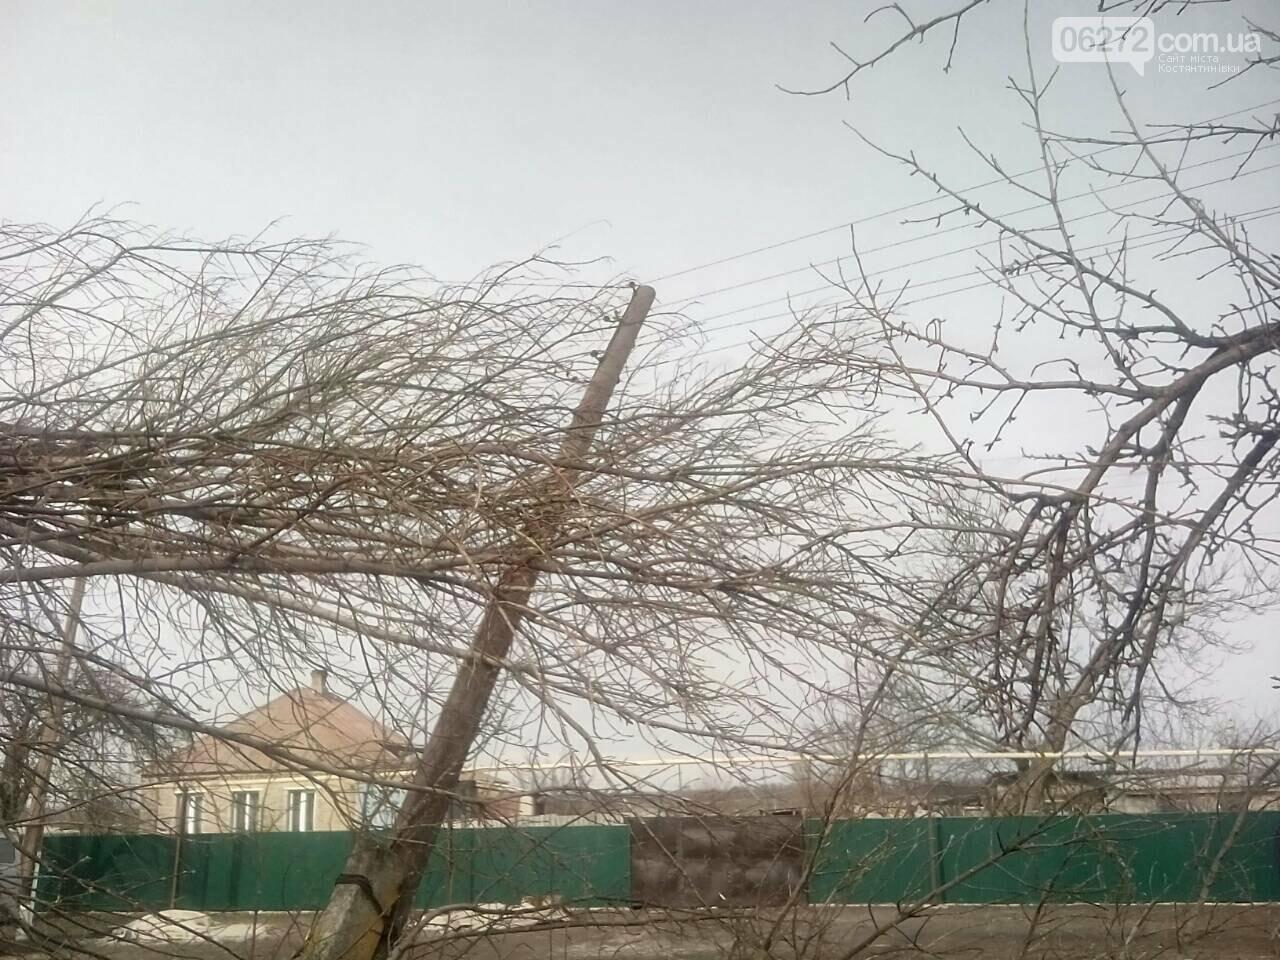 В Константиновском районе дерево упало на столб линии электропередач, фото-5